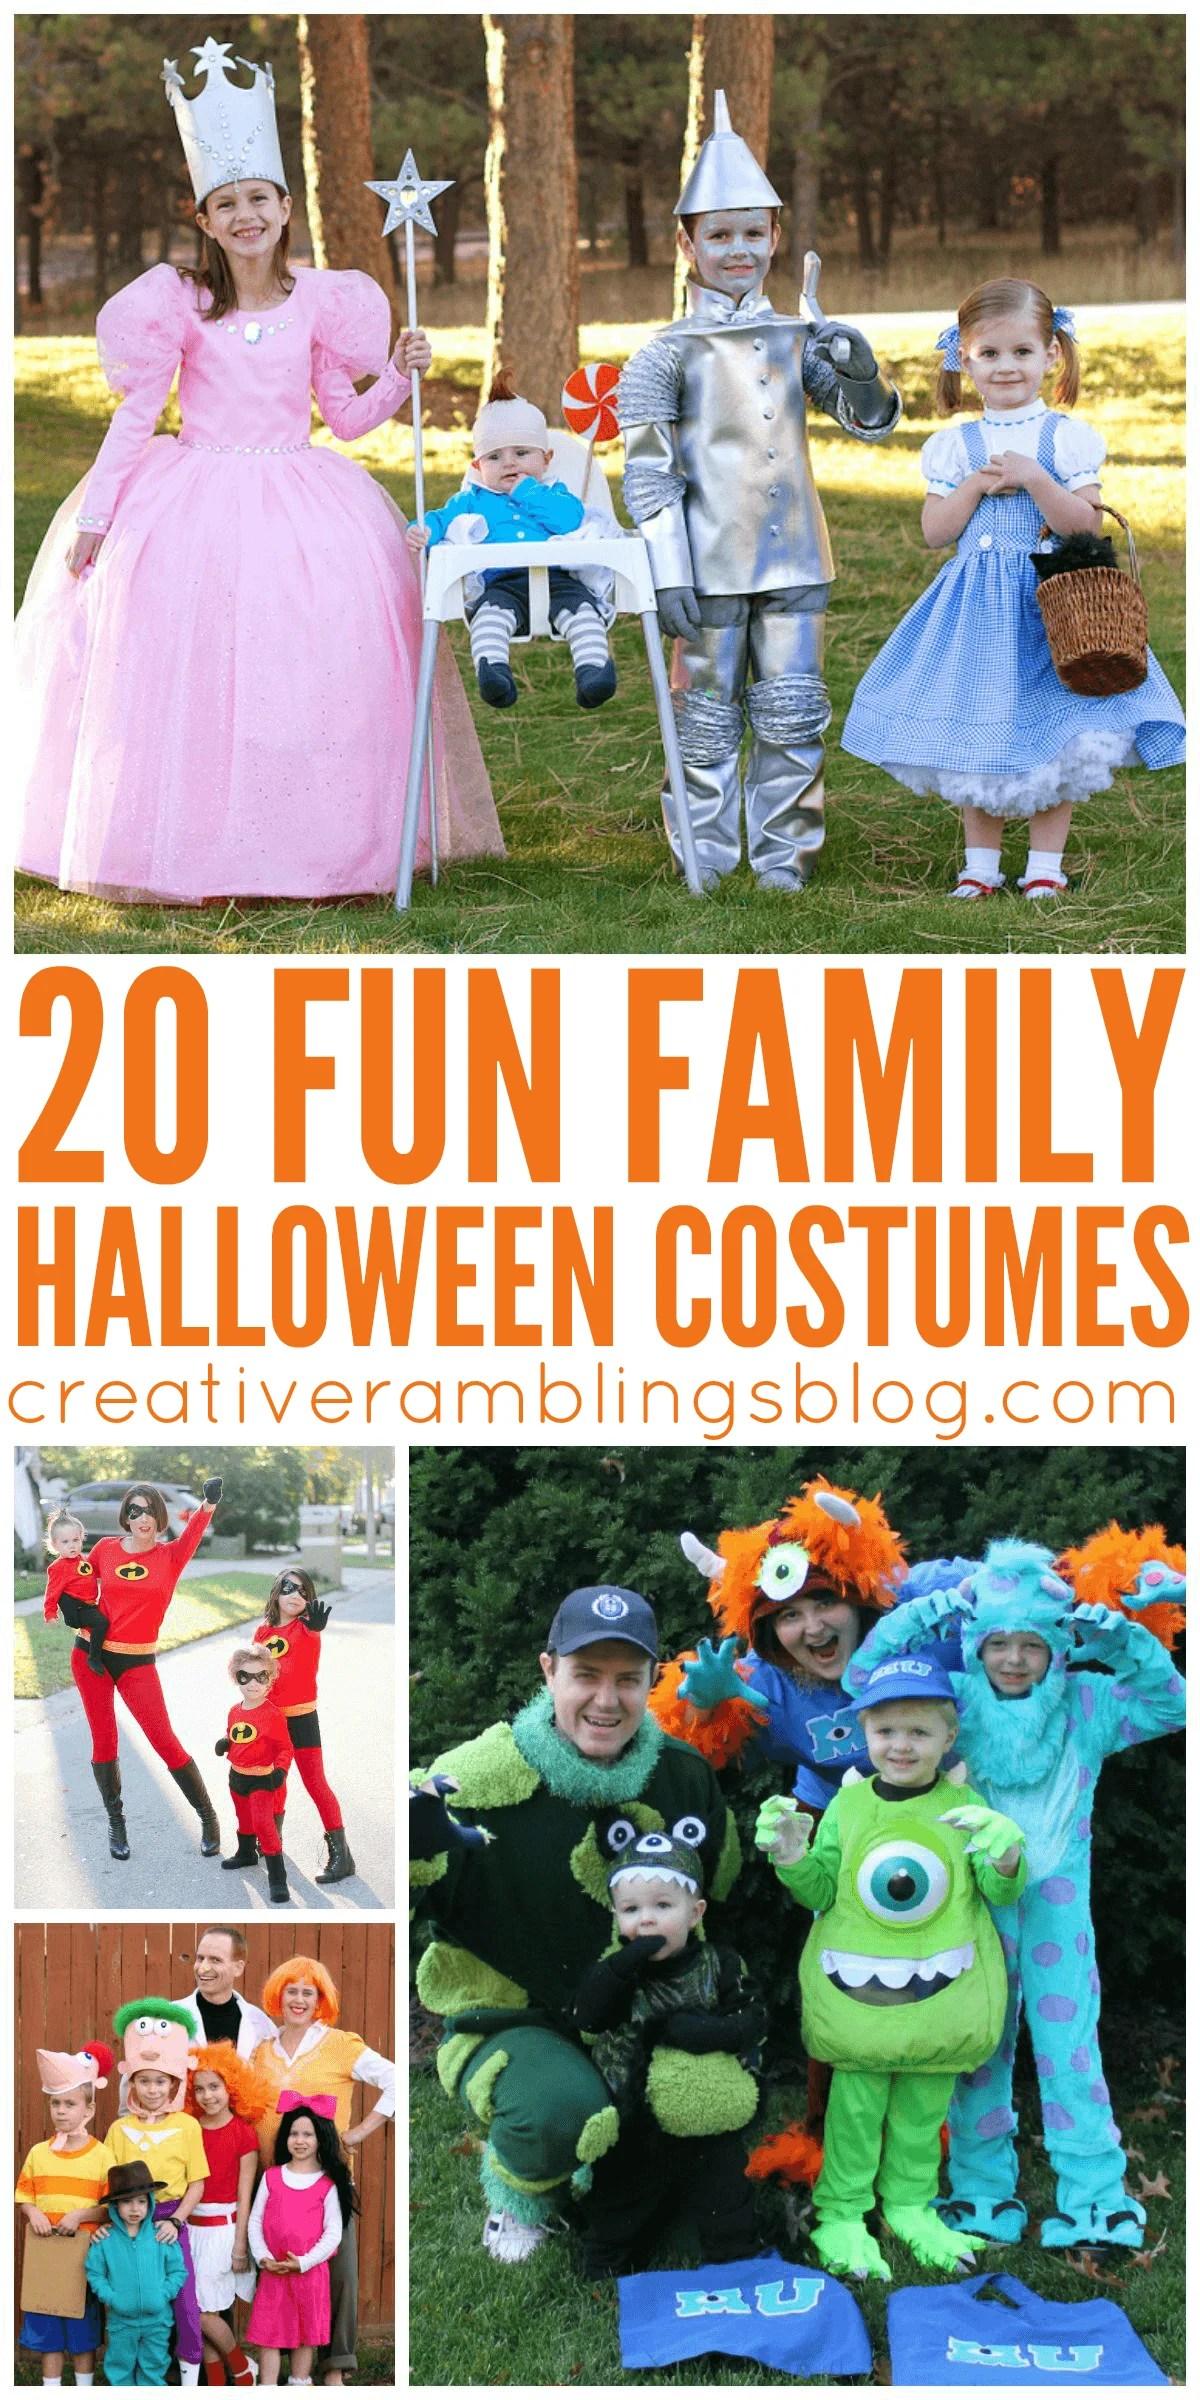 20 Fun Family Halloween Costumes